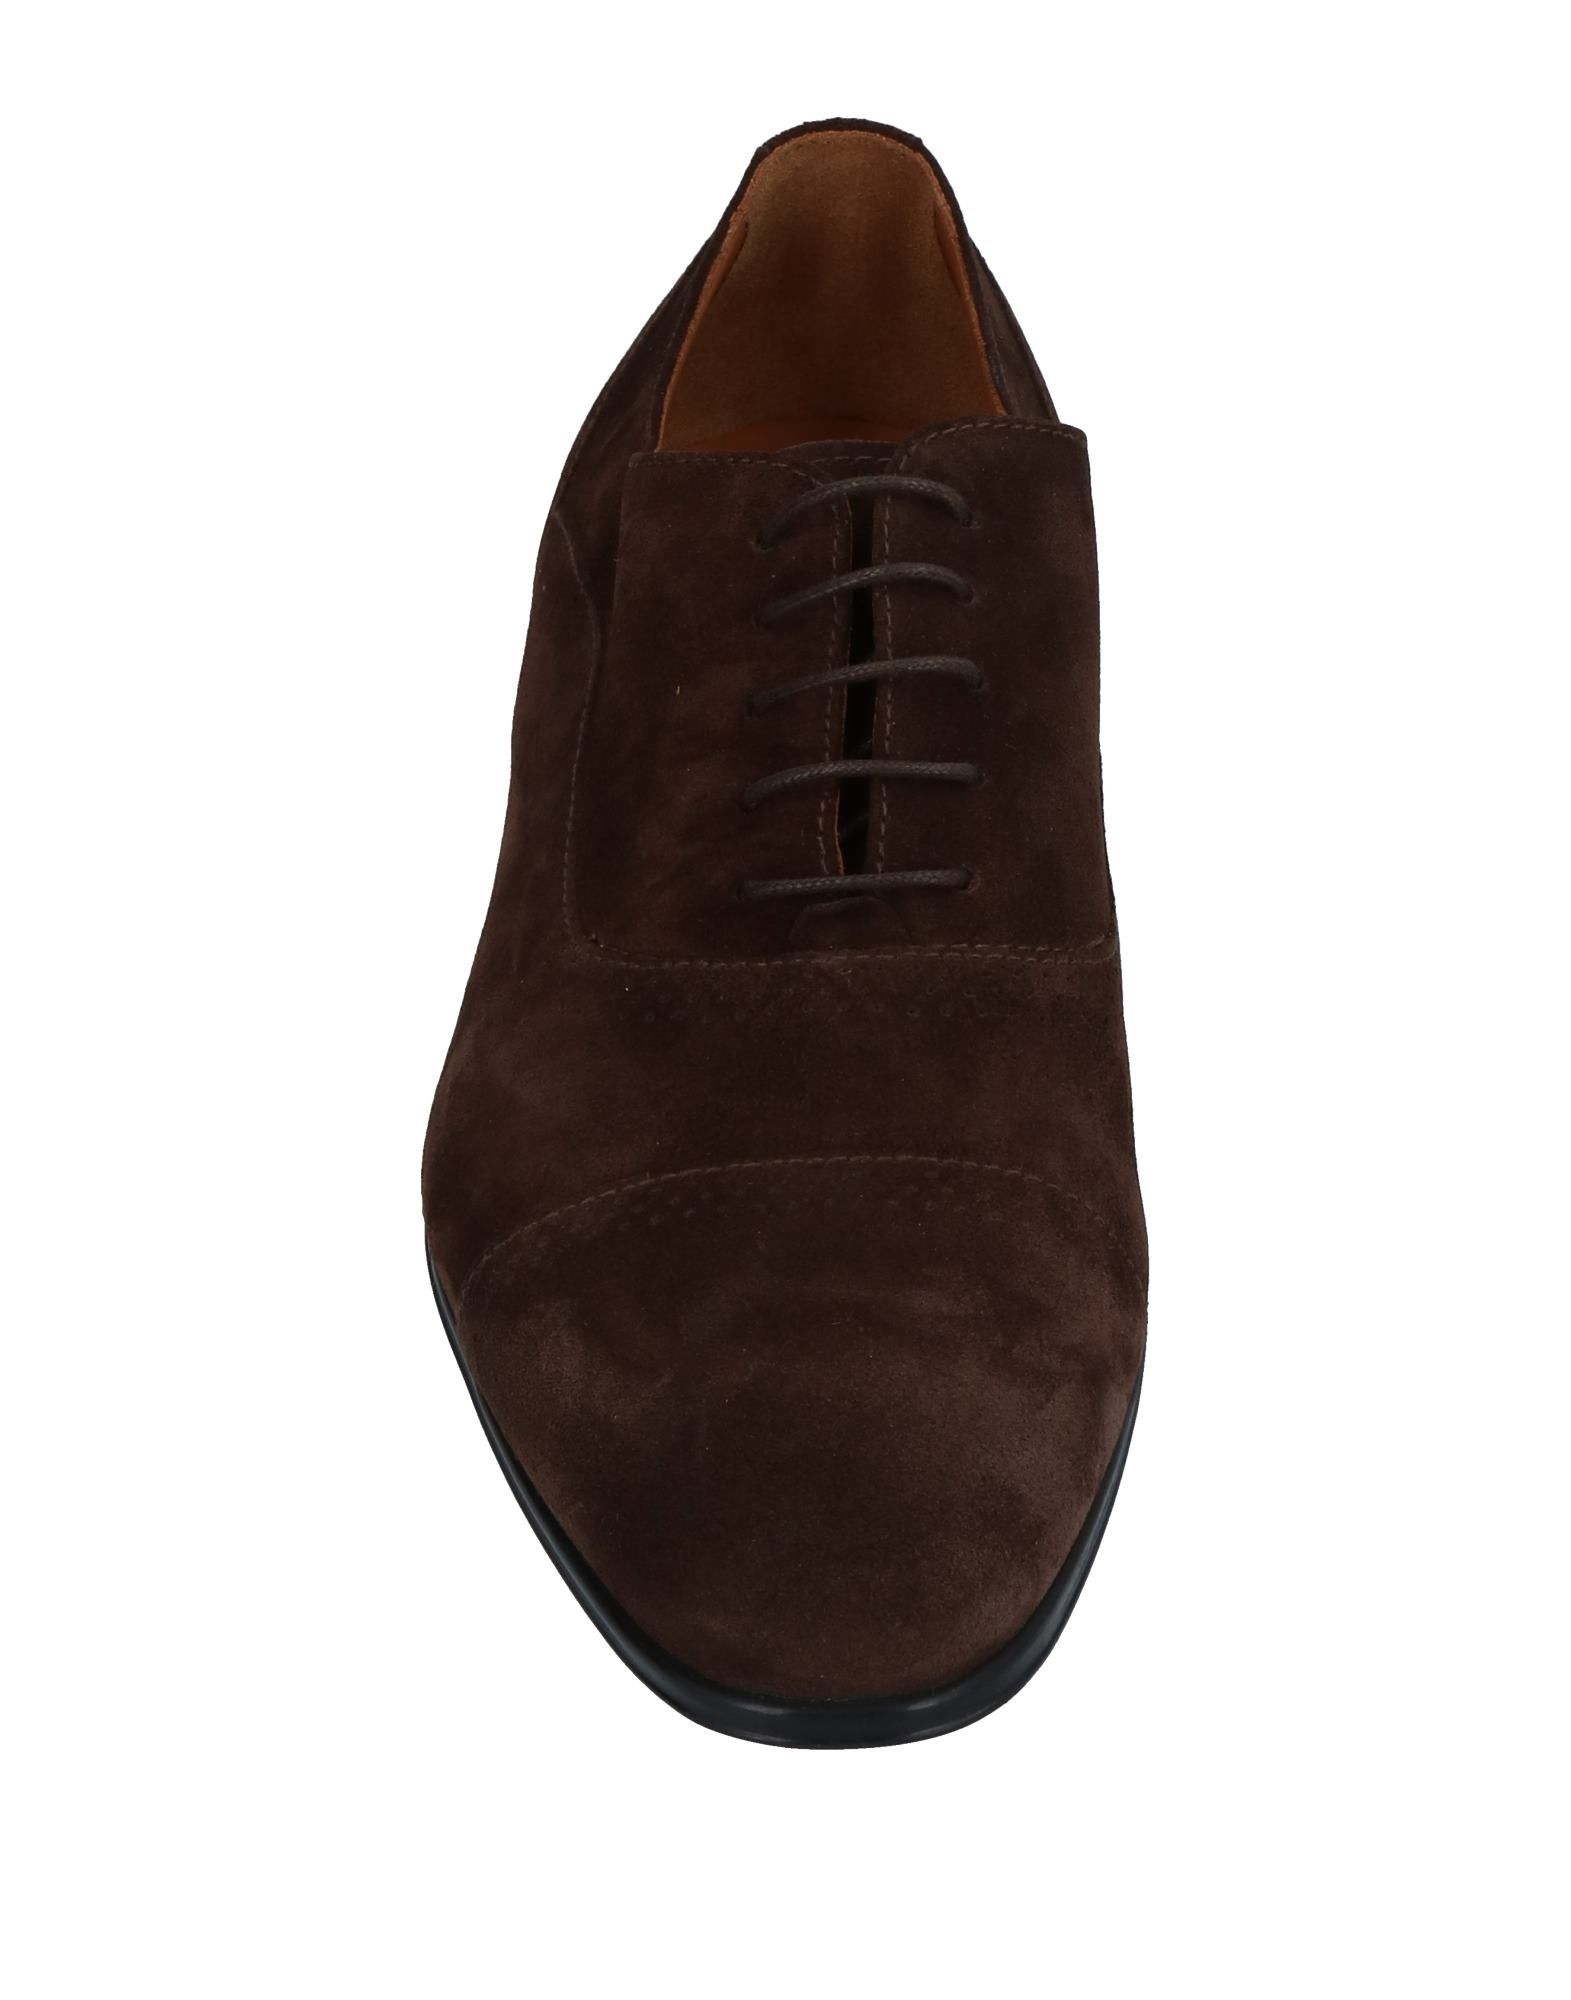 Doucal's Heiße Schnürschuhe Herren  11394929CJ Heiße Doucal's Schuhe 750984